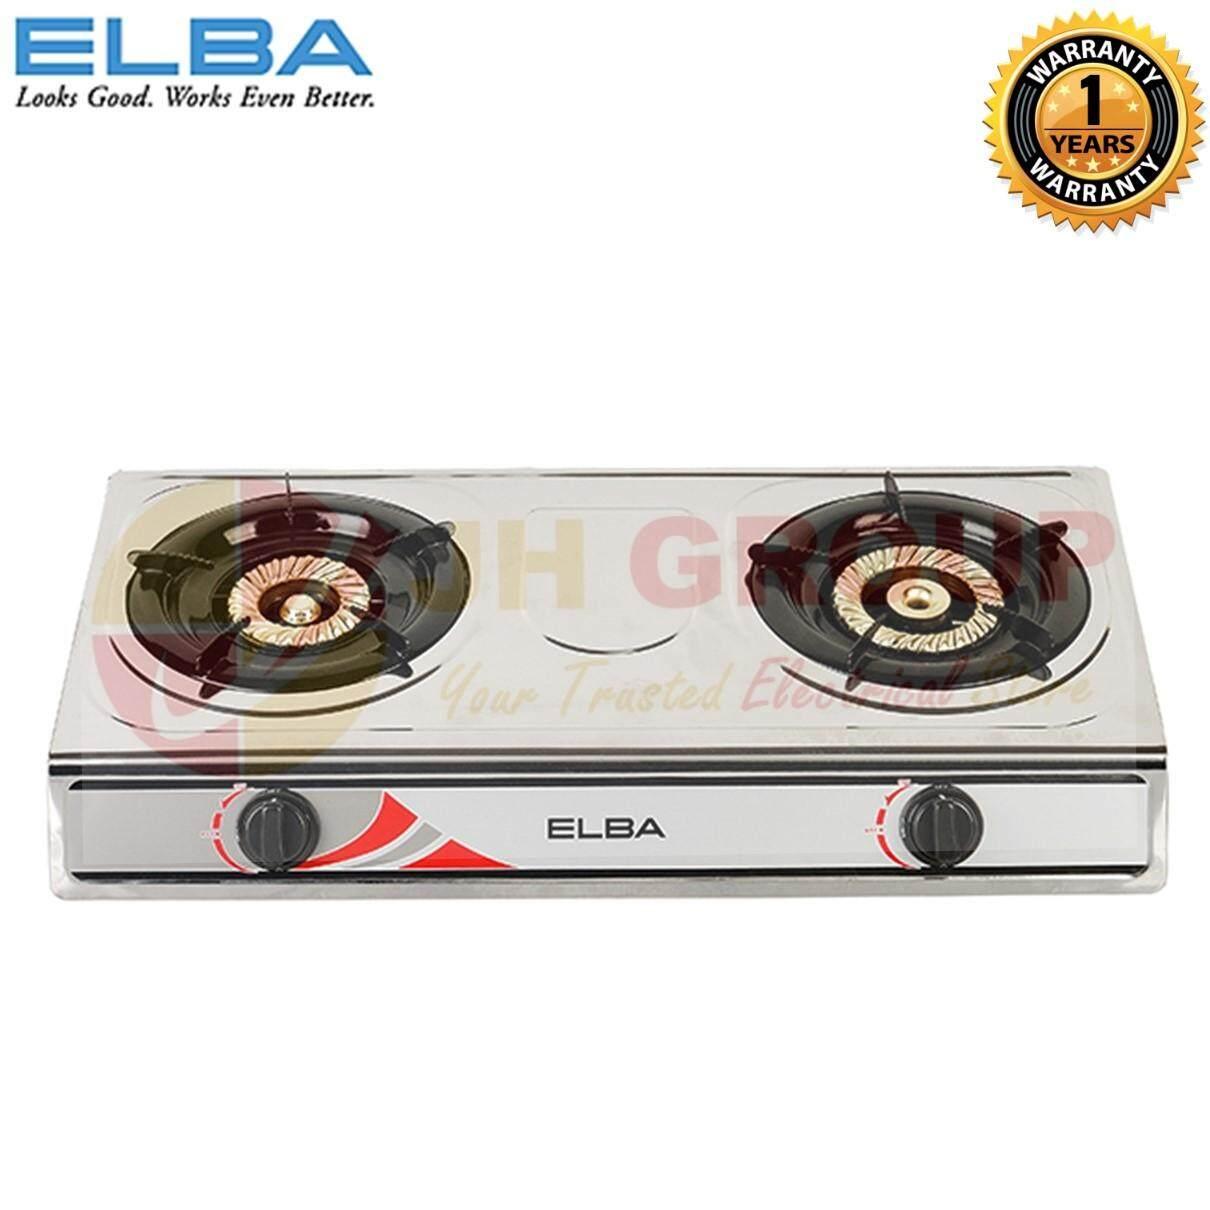 ELBA 5260SS 2 BURNER GAS STOVE w ENAMEL PAN *NEWER DESIGN THAN ELBA EGS-F7112